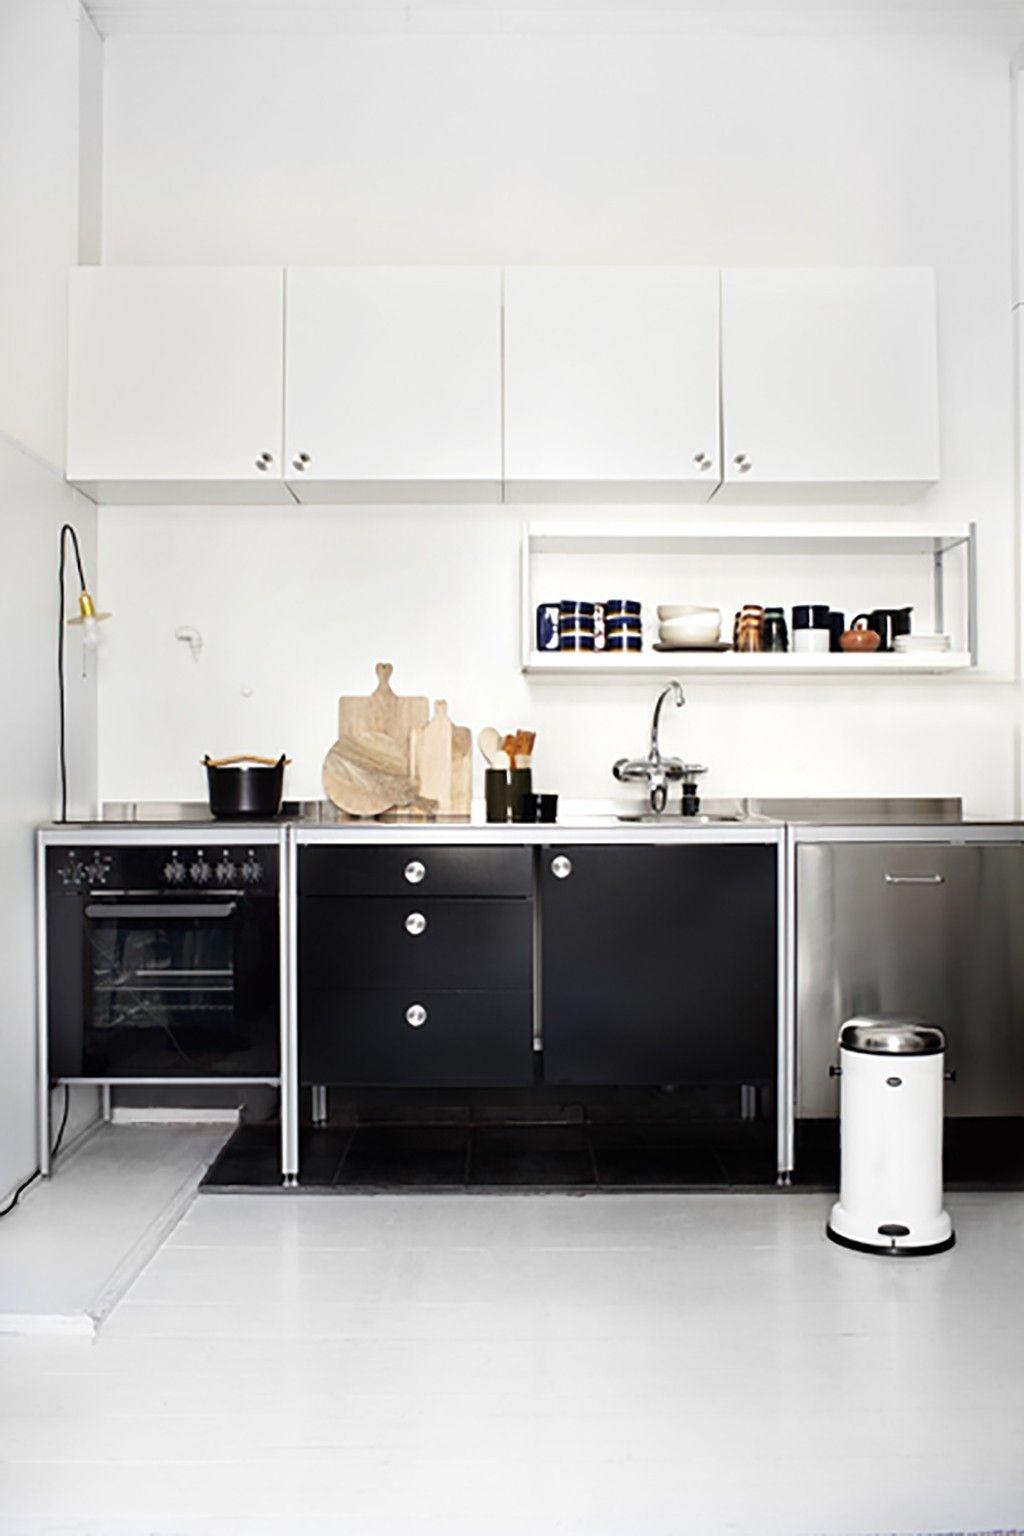 Kitchen in 3 style for Deko-magazine by Susanna Vento, photos Kristiina Kurronen